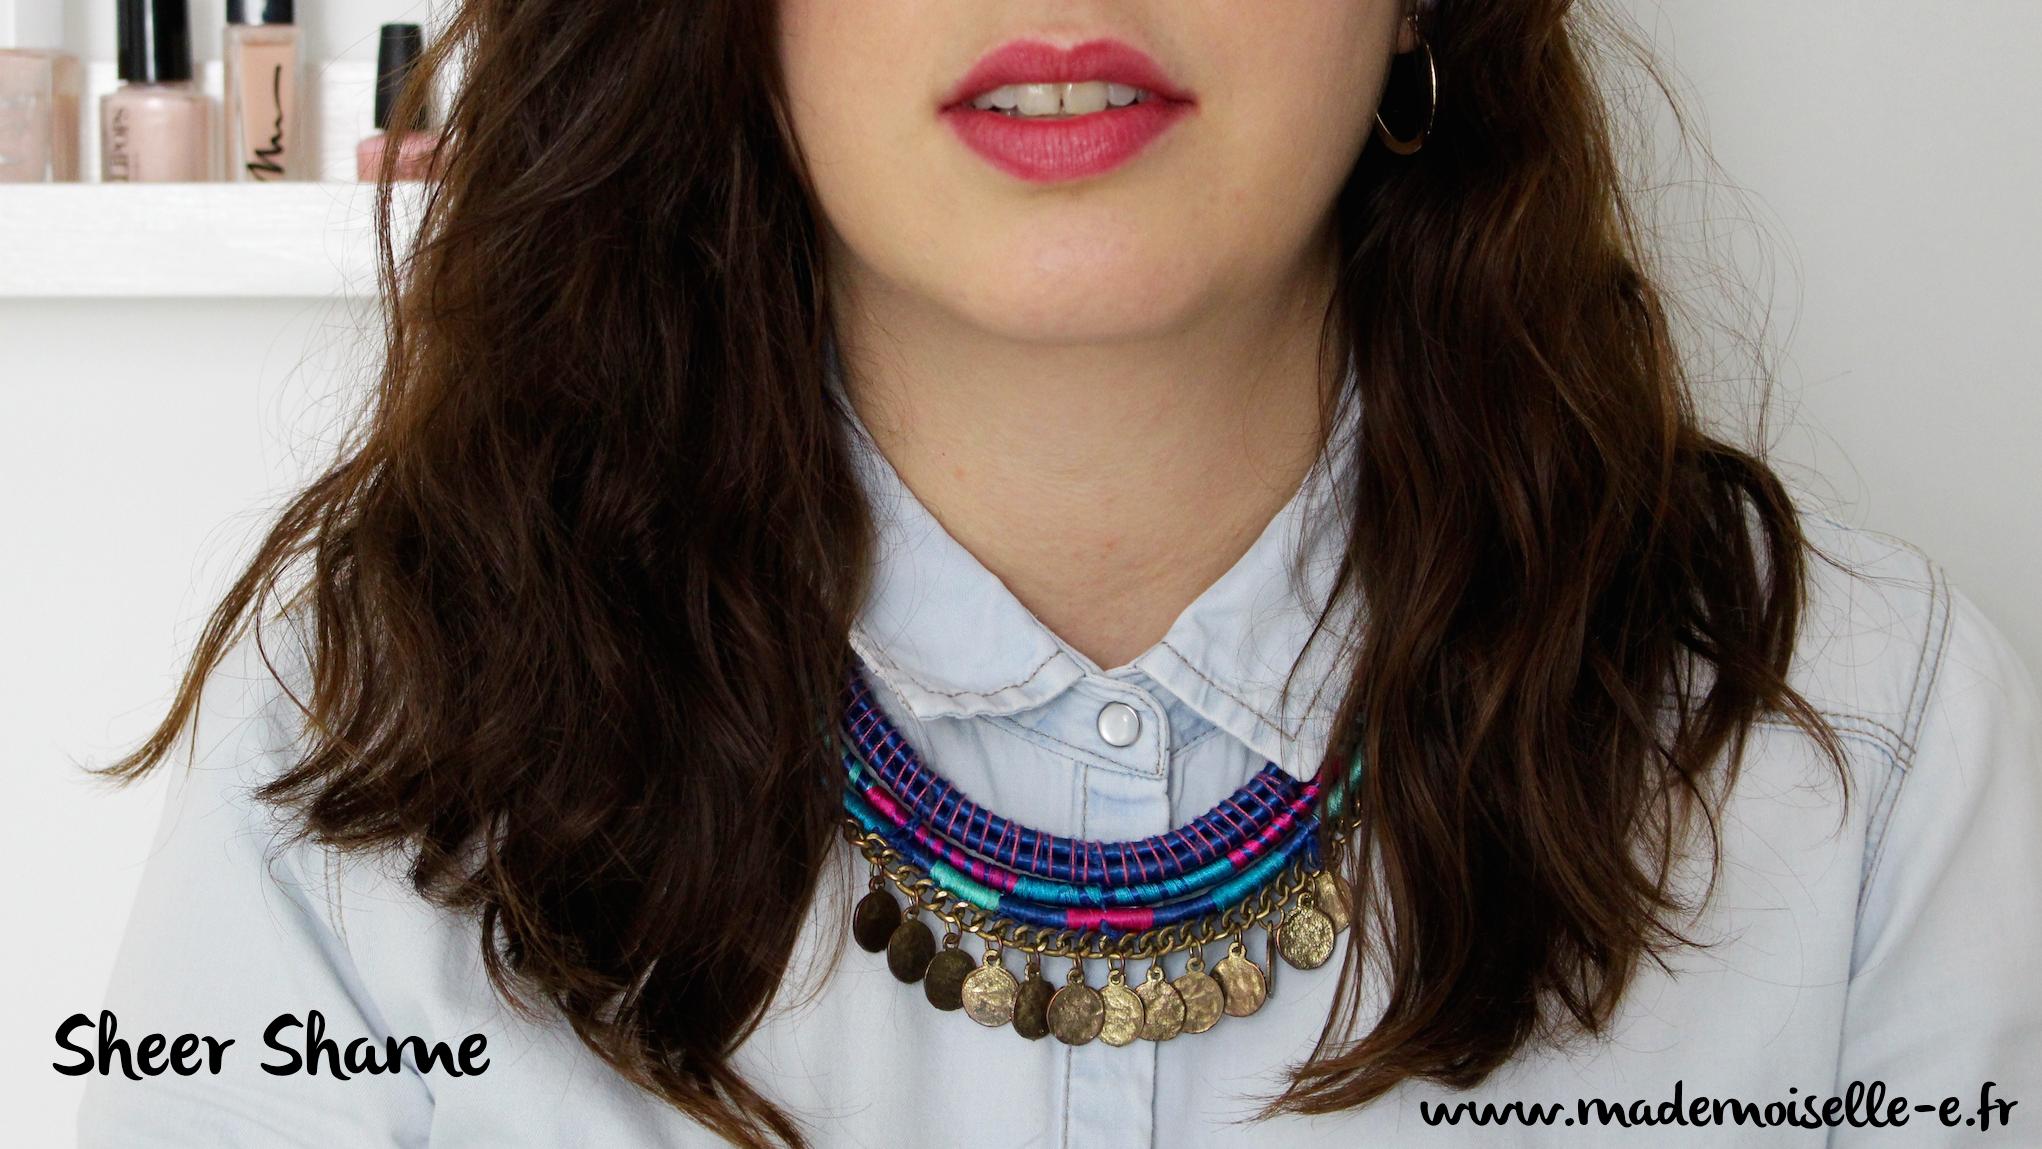 lipstick_vice_sheer_shame_mademoiselle-e